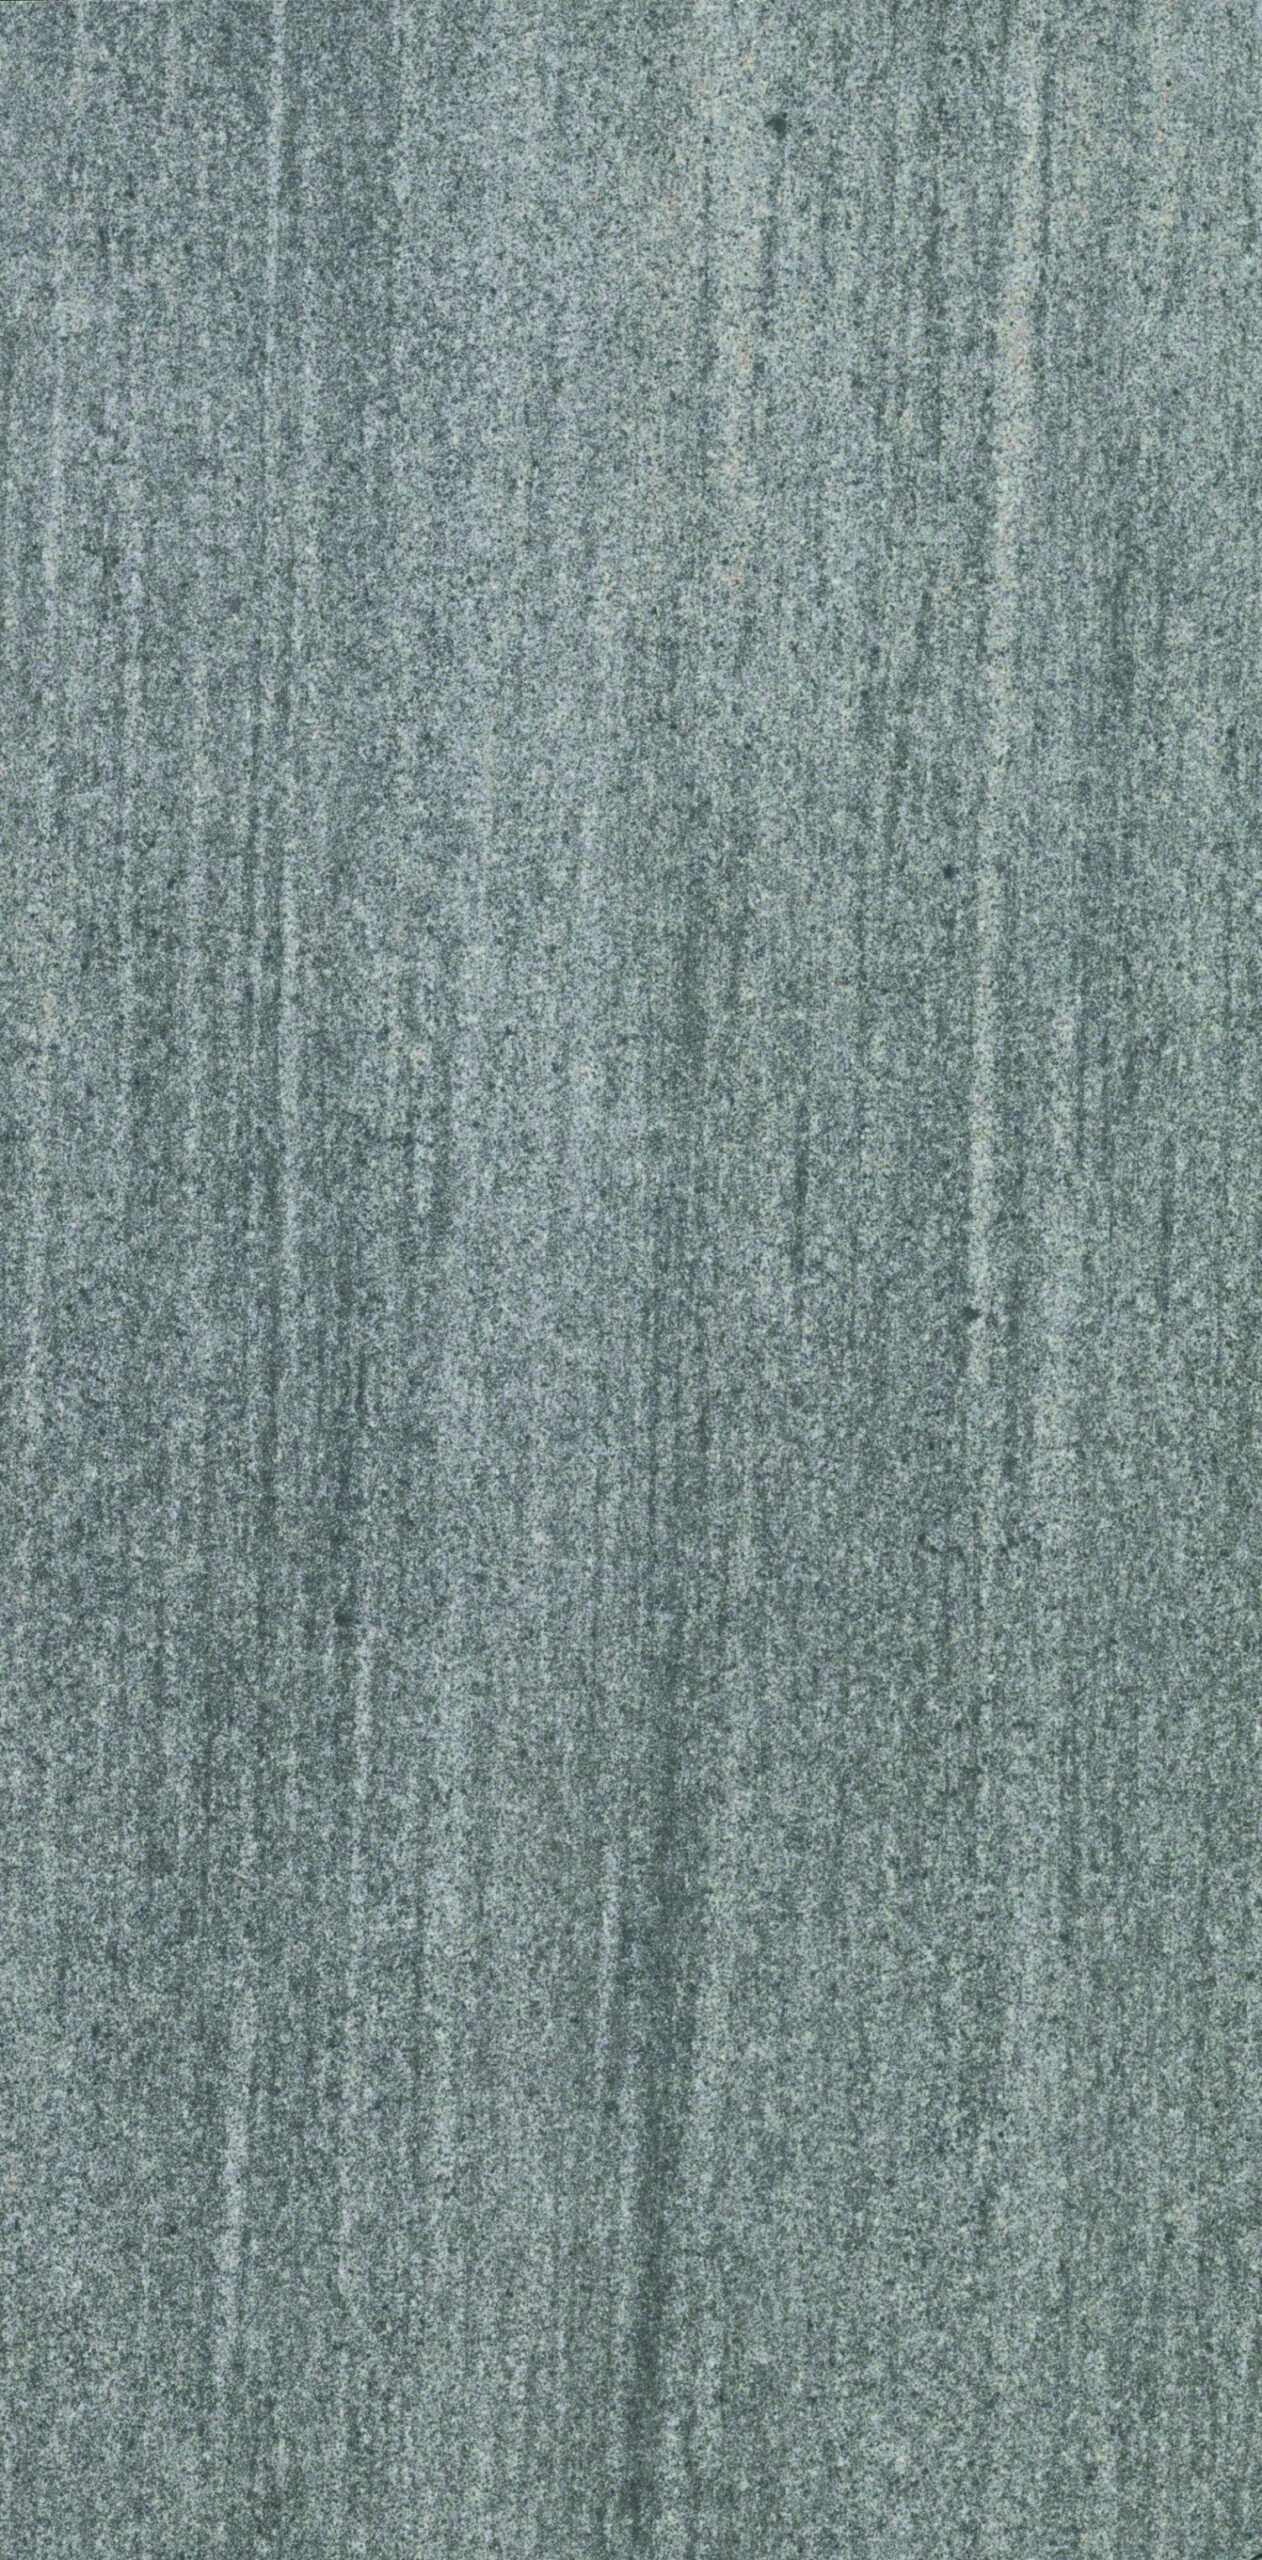 Materia 3D sp m3 heather grey 1224 f1 USH1224080 scaled